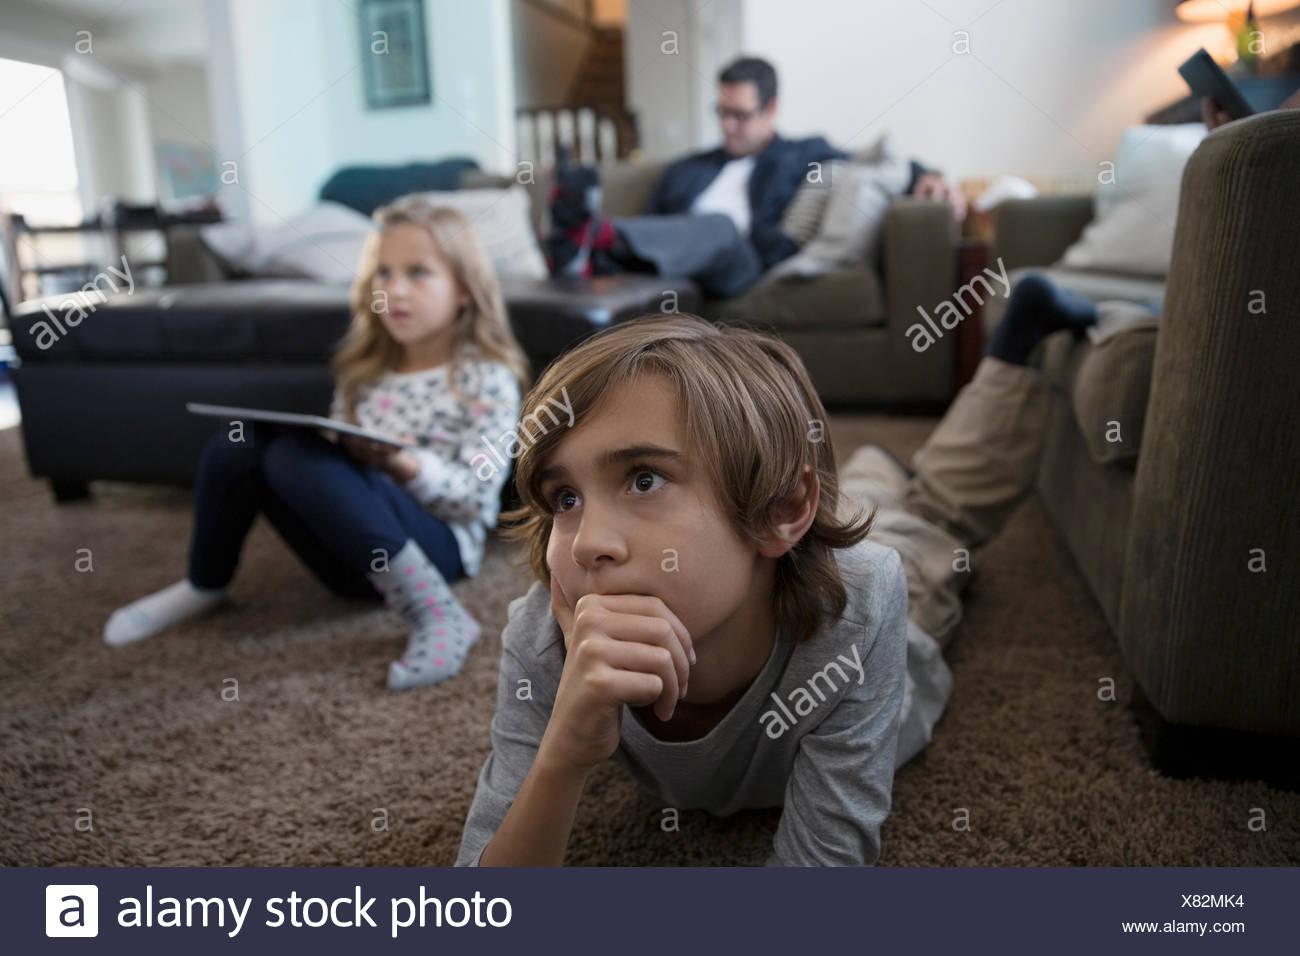 Serious boy watching TV on living room floor - Stock Image